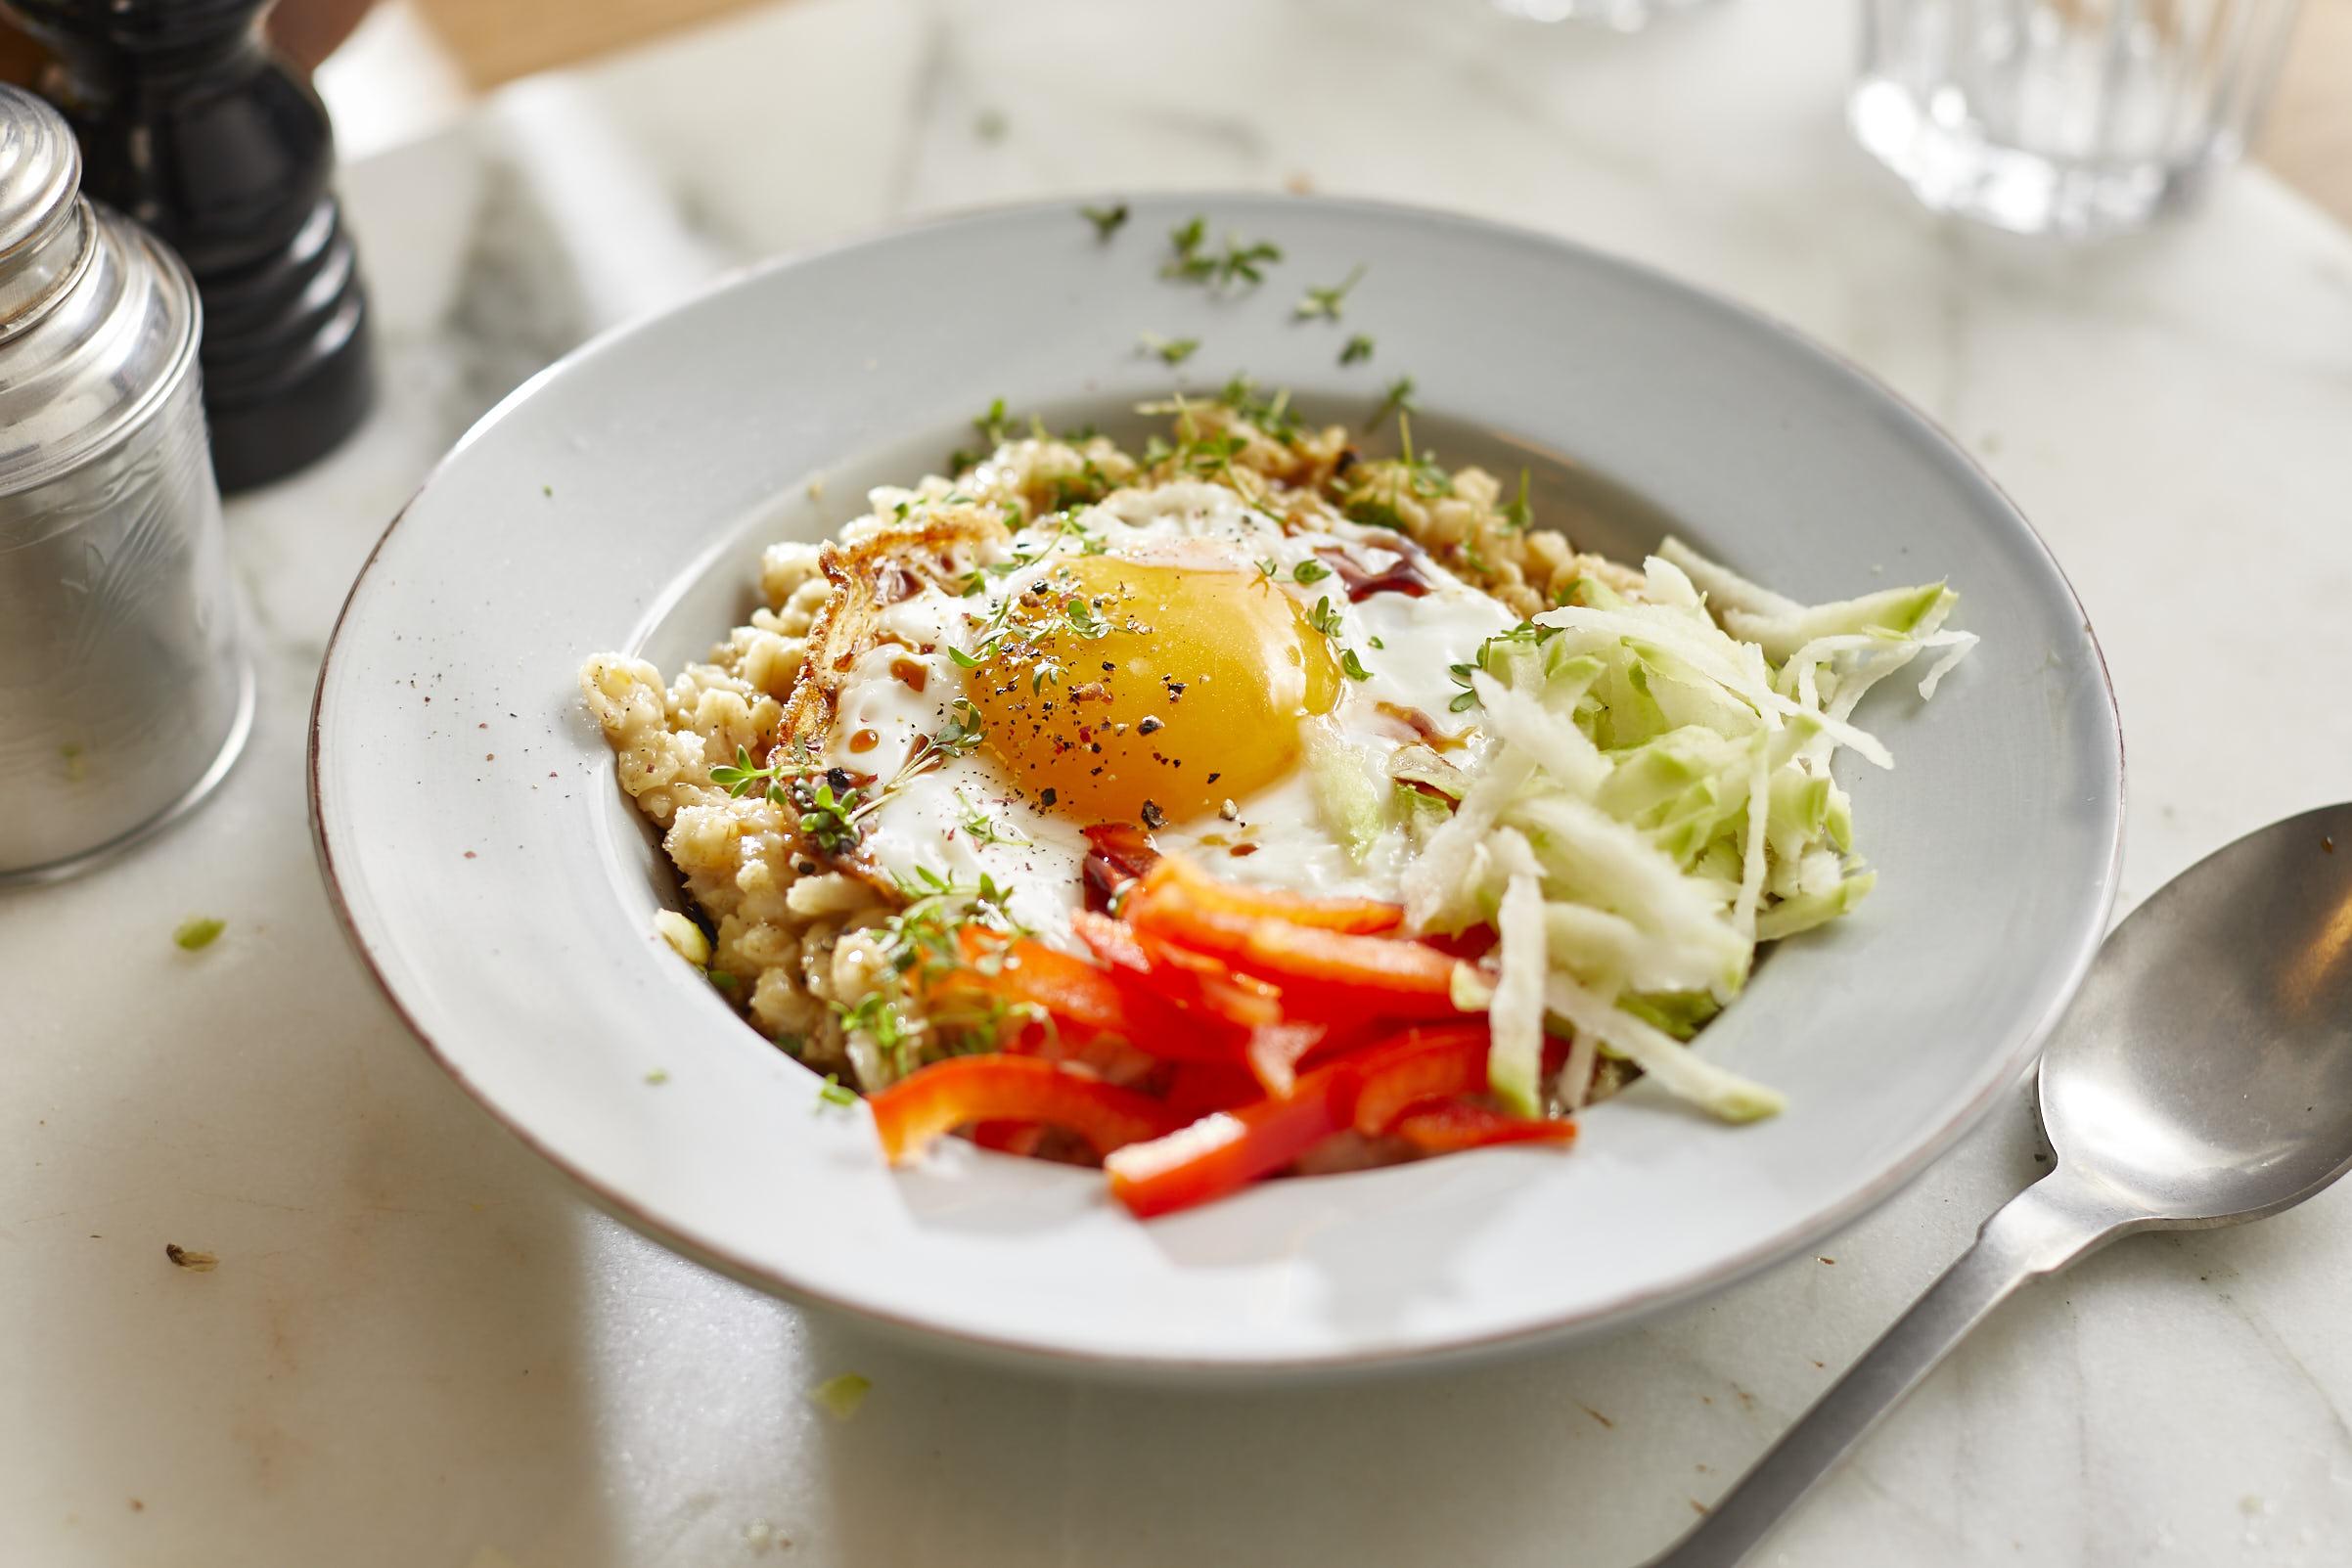 pikantes-porridge-ei-gemüse-rezept-